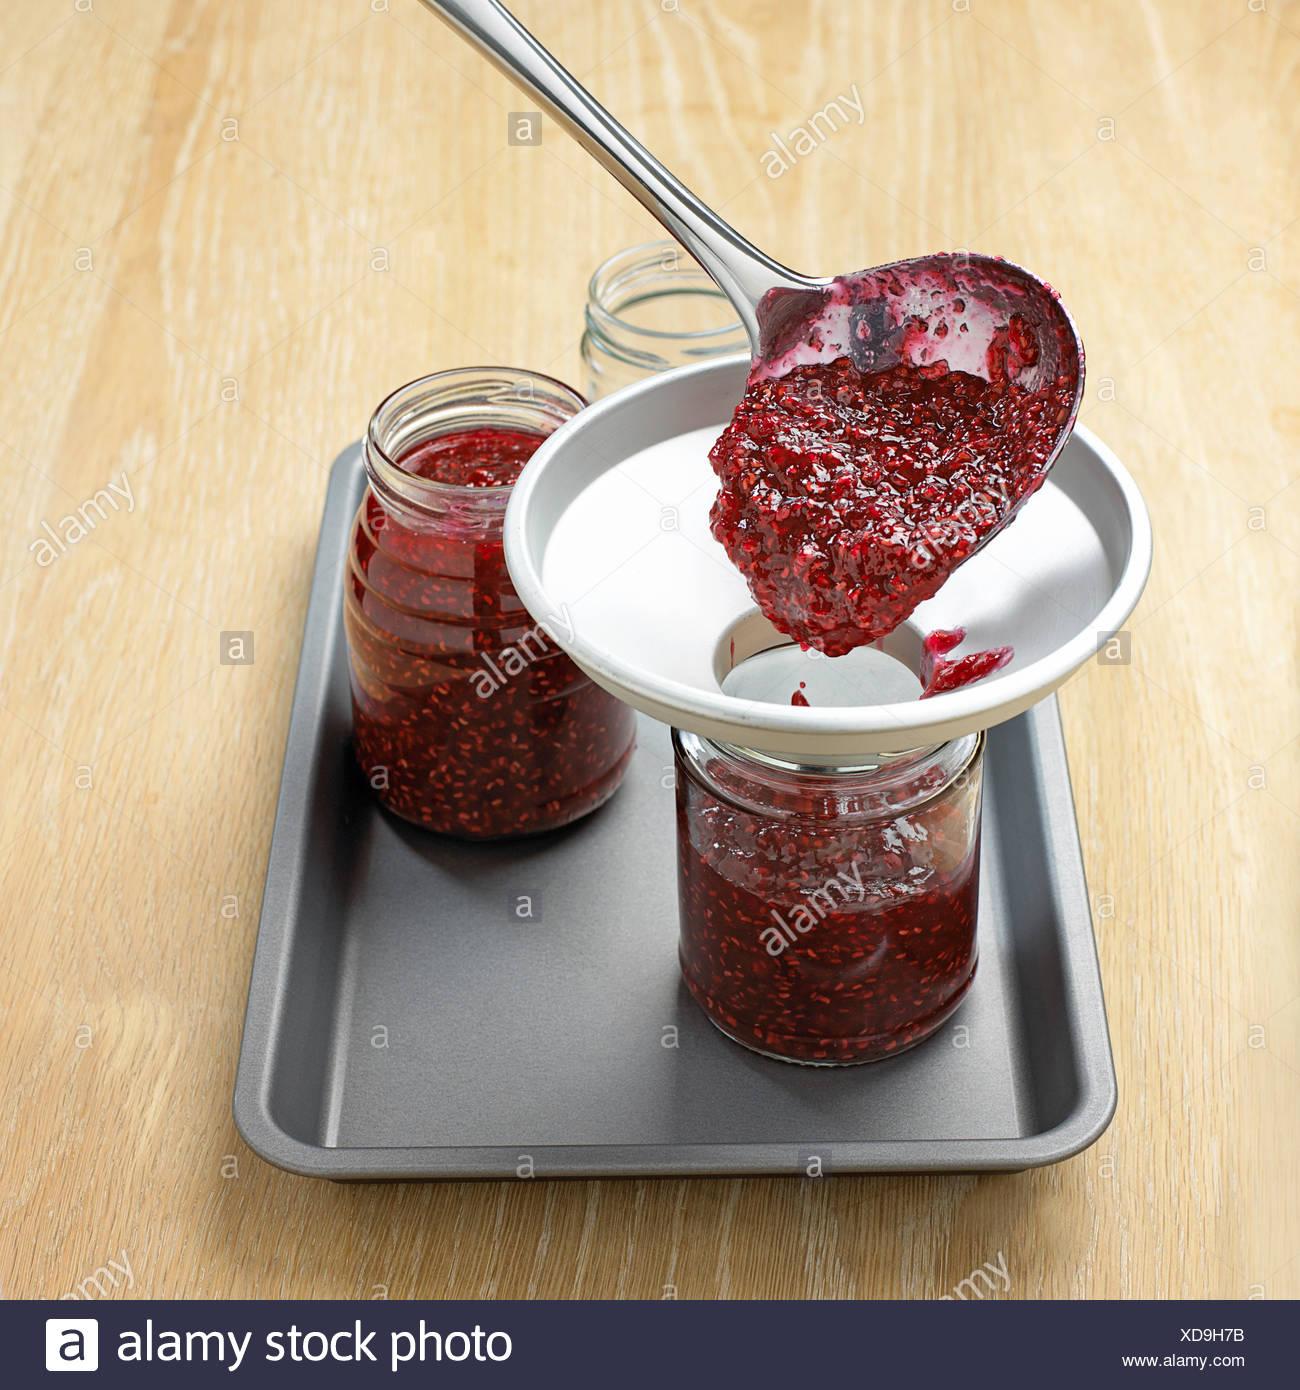 Putting jam into jars through funnel, close-up - Stock Image